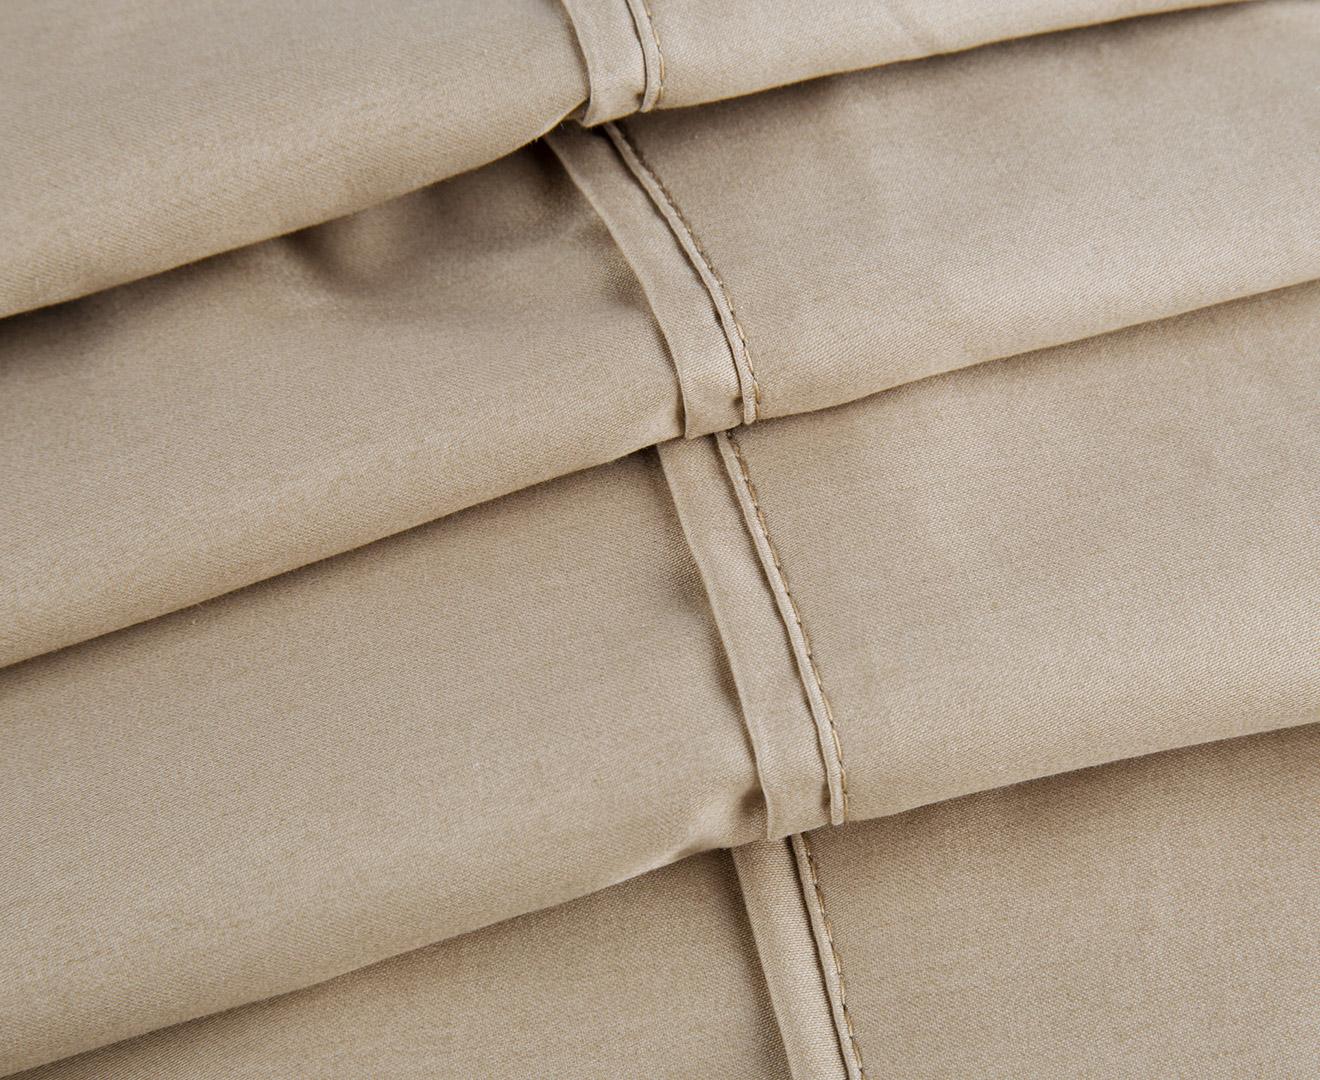 62e81badfe7 VIVA 1000TC Premium Egyptian Cotton Queen Bed Sheet Set - Linen ...